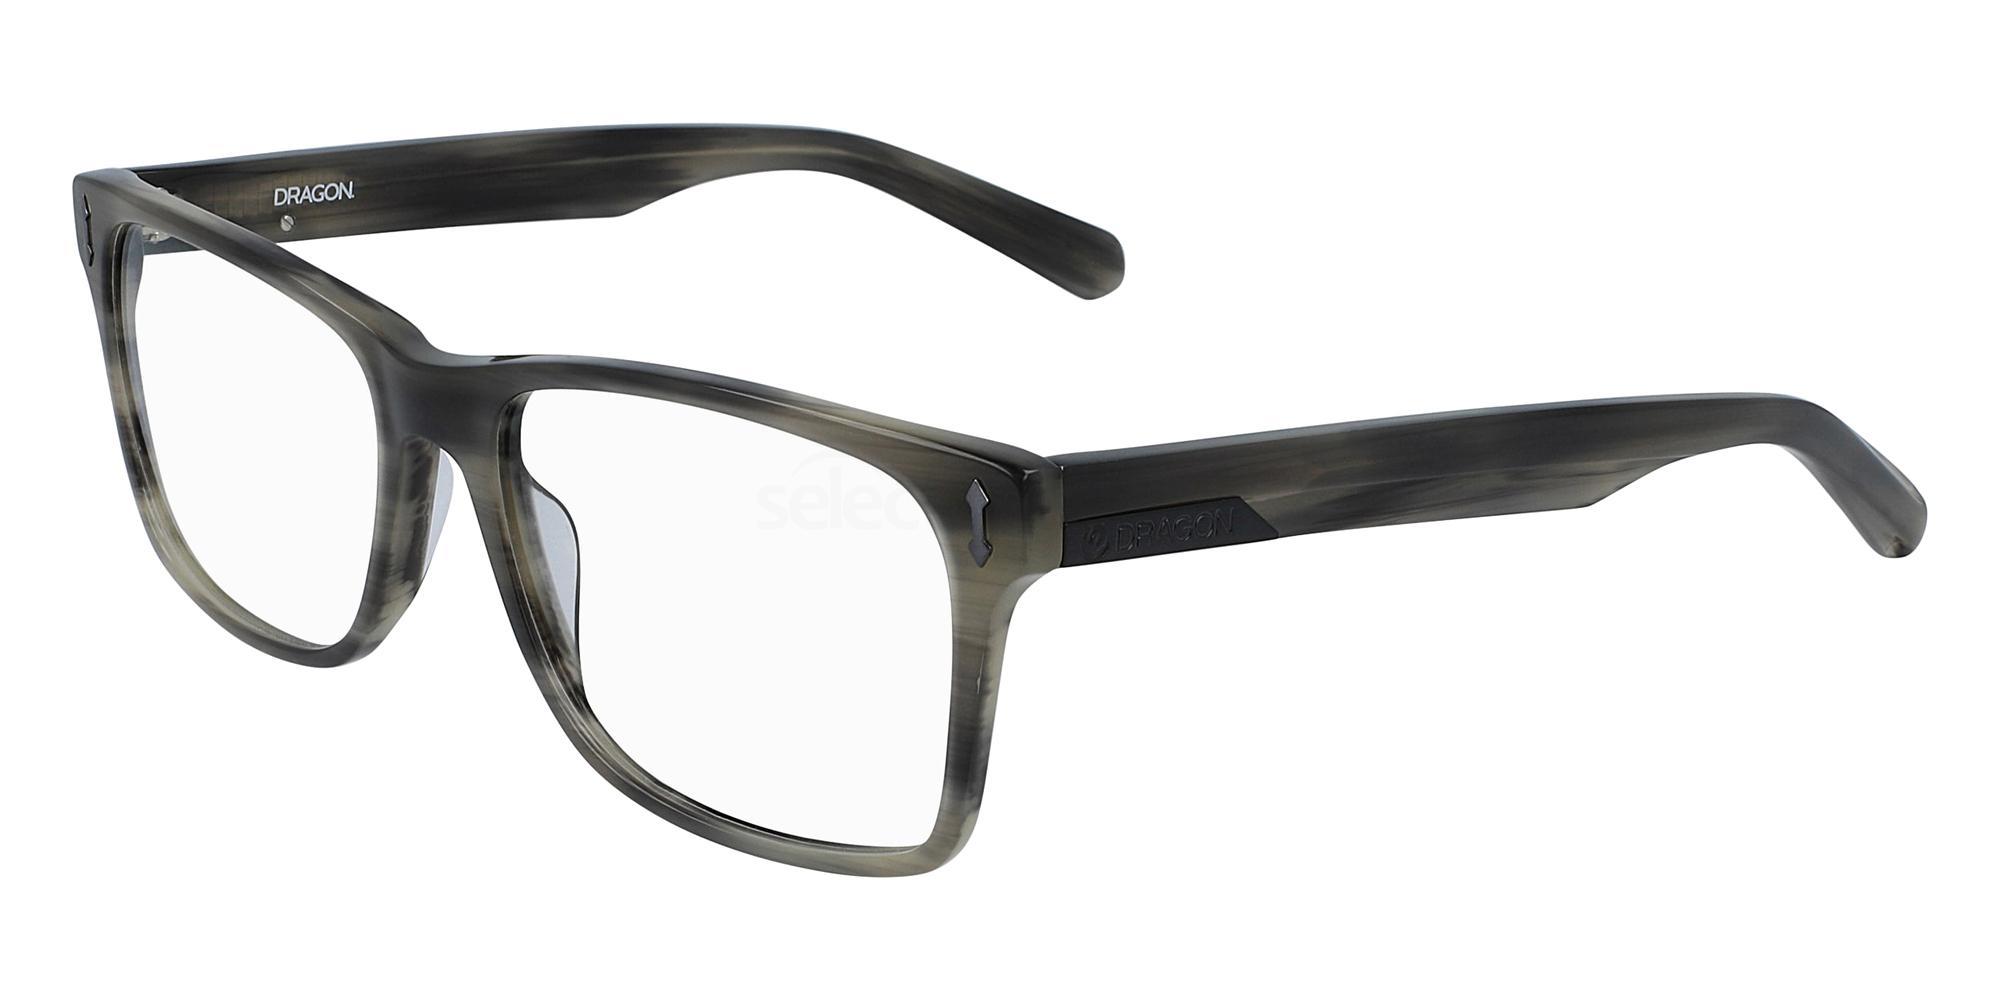 036 DR132 SPENCER Glasses, Dragon